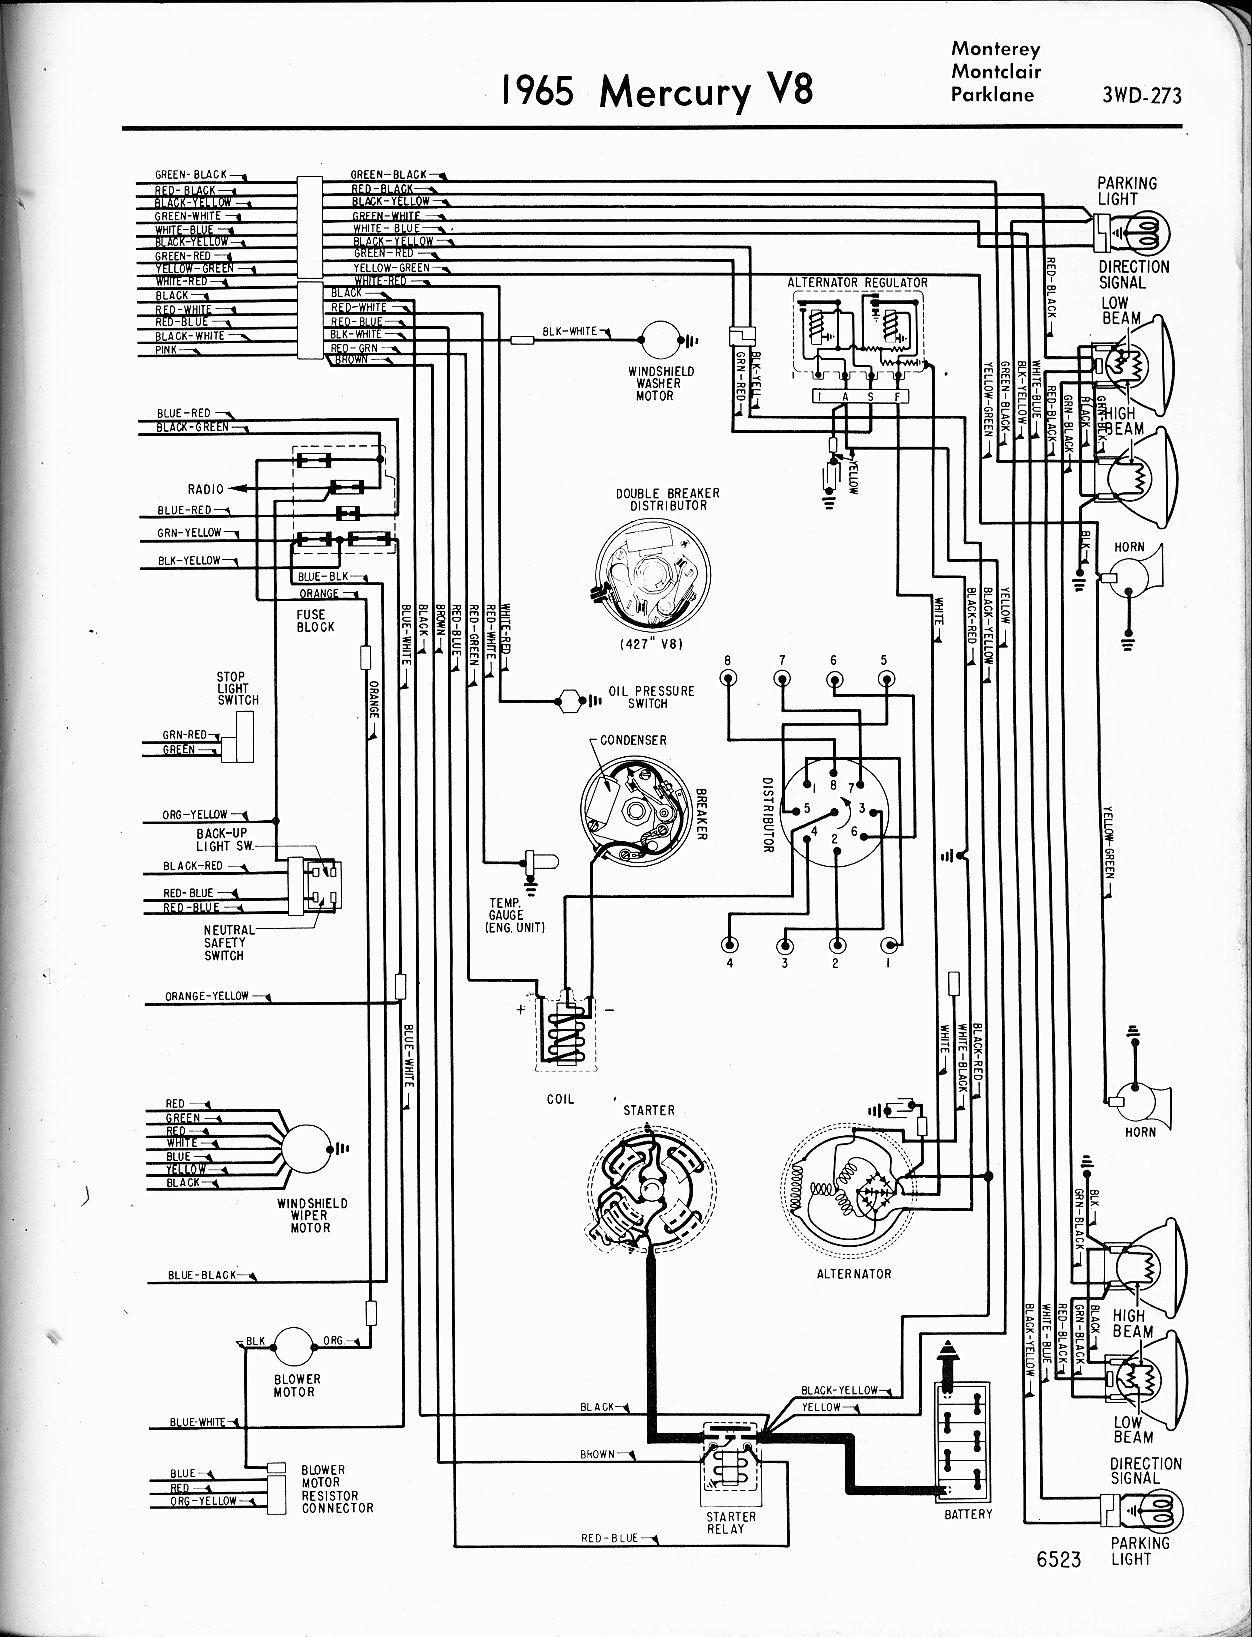 Old Voltage Regulator Schematic Best Secret Wiring Diagram Circuit Of 7805 Harley Problems Imageresizertool Com 12v